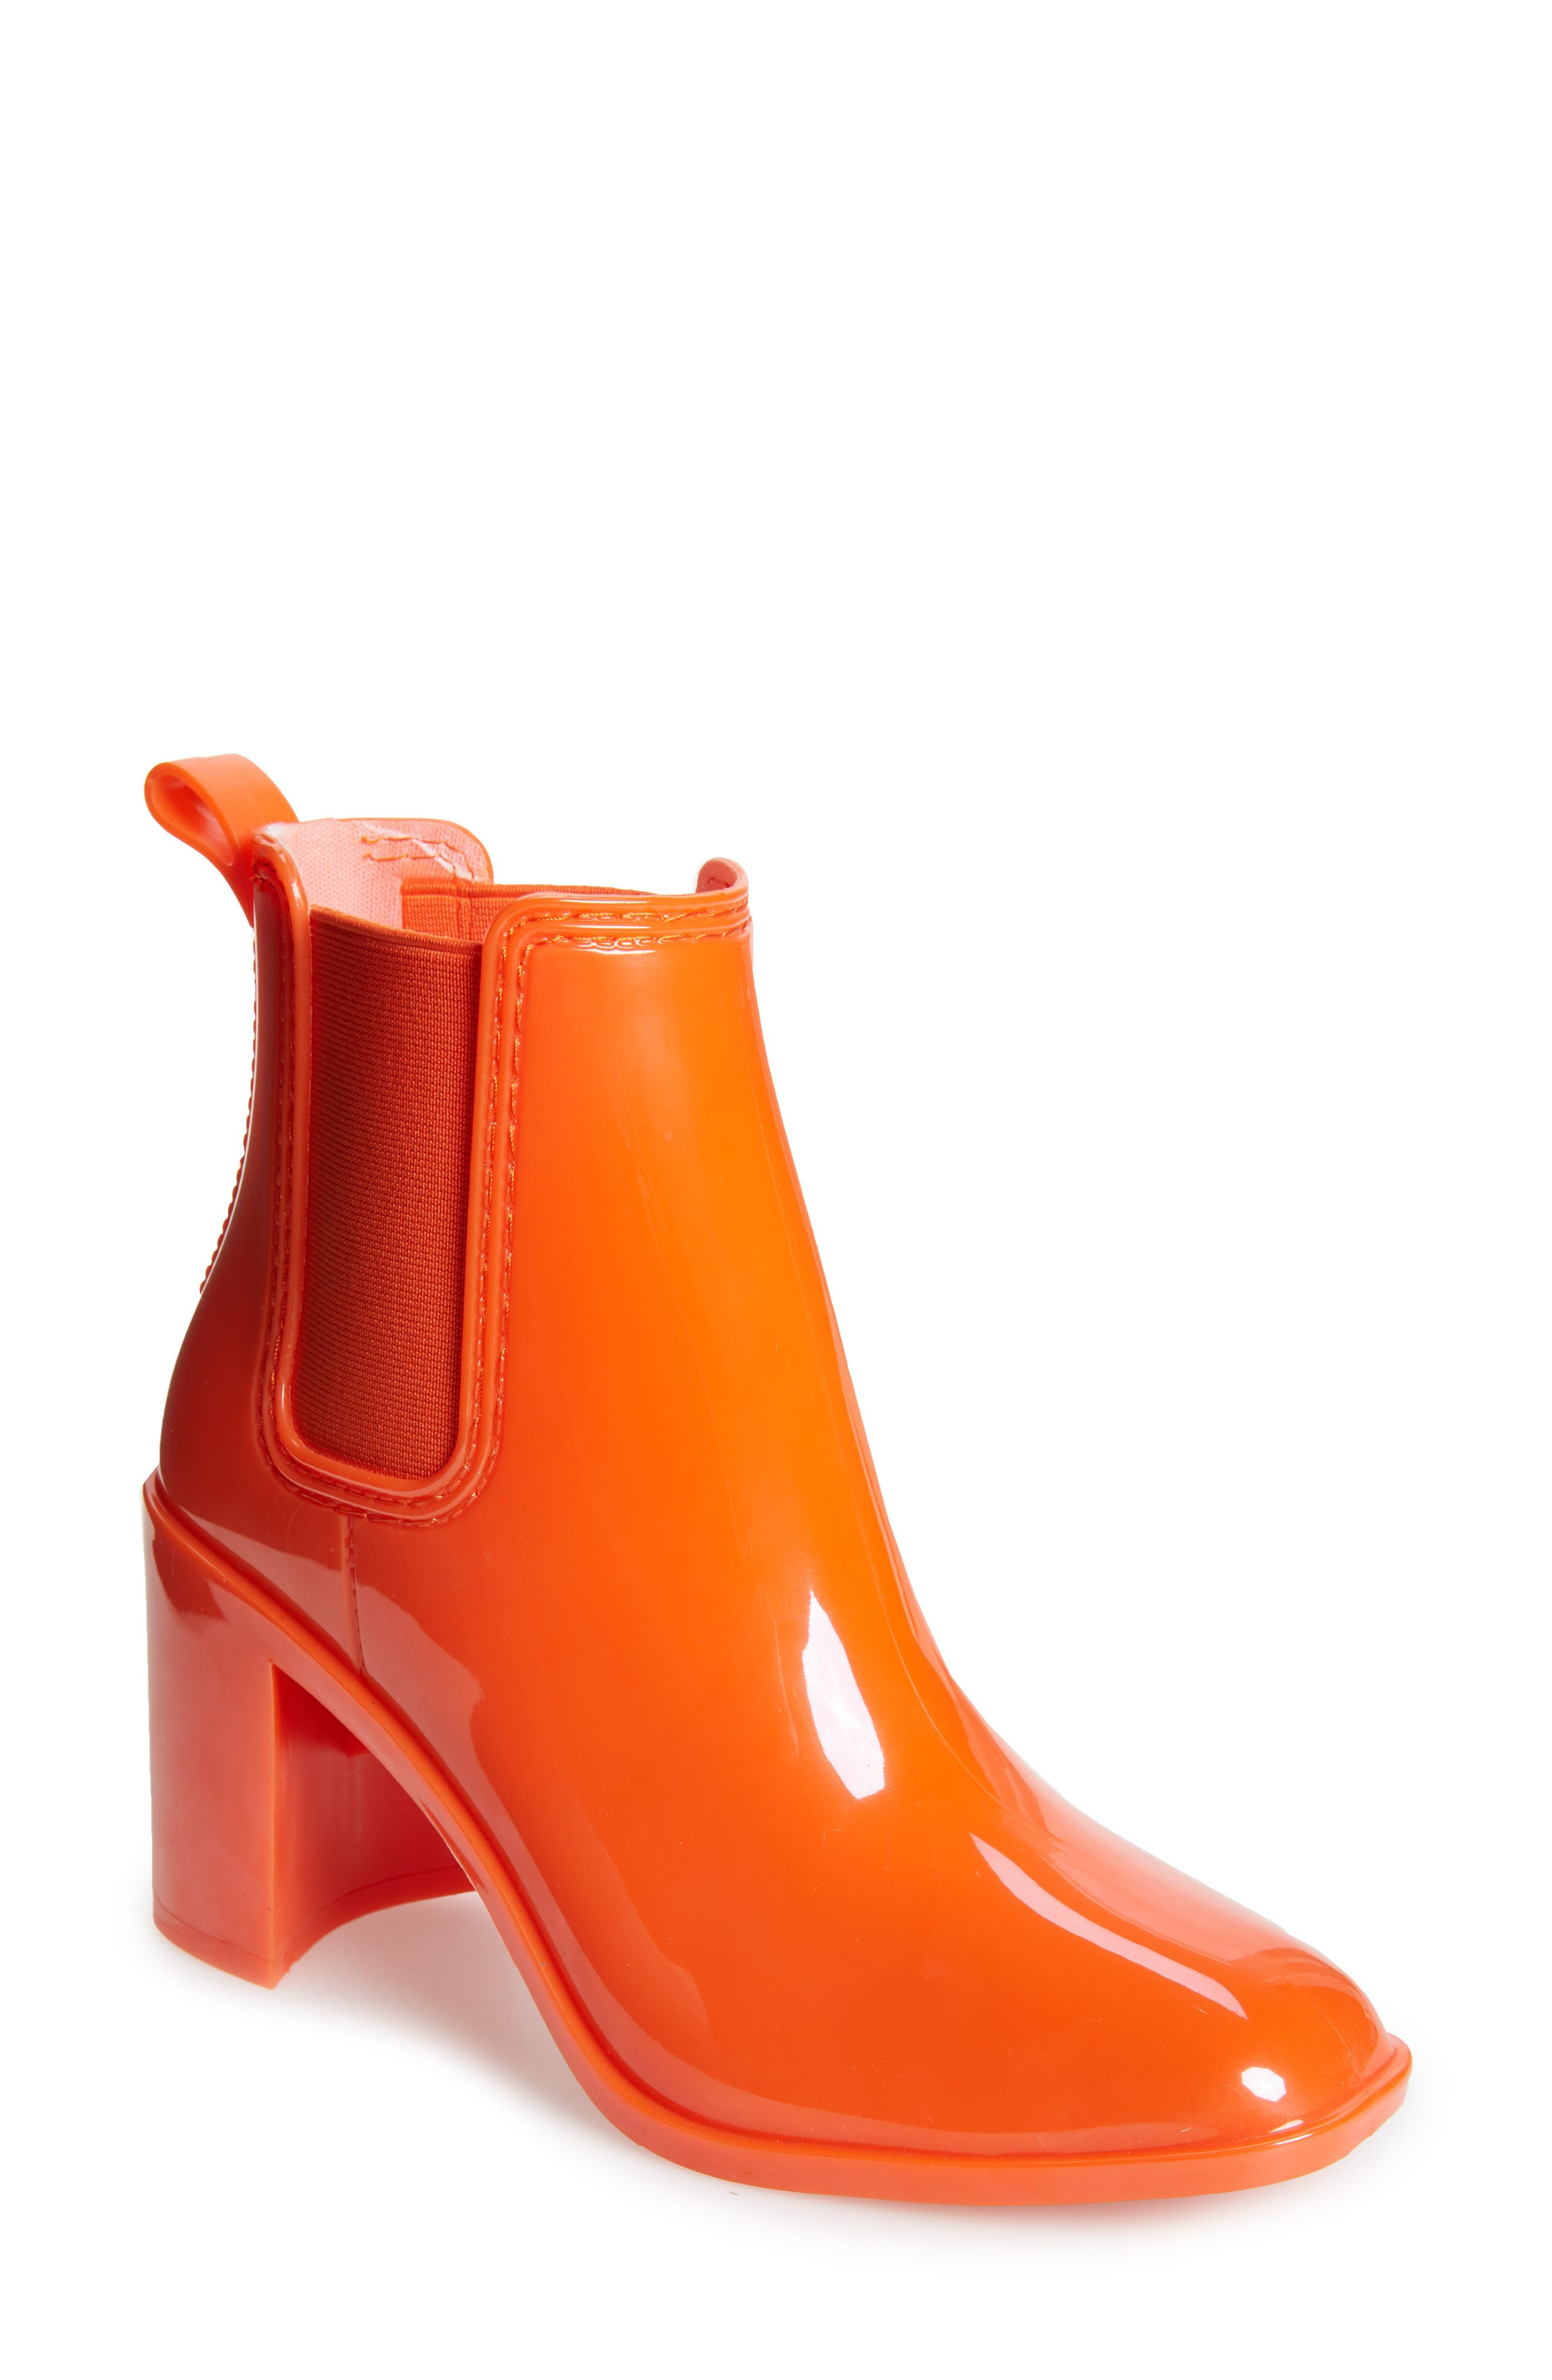 Jeffrey Campbell Hurricane Waterproof Boot, Orange